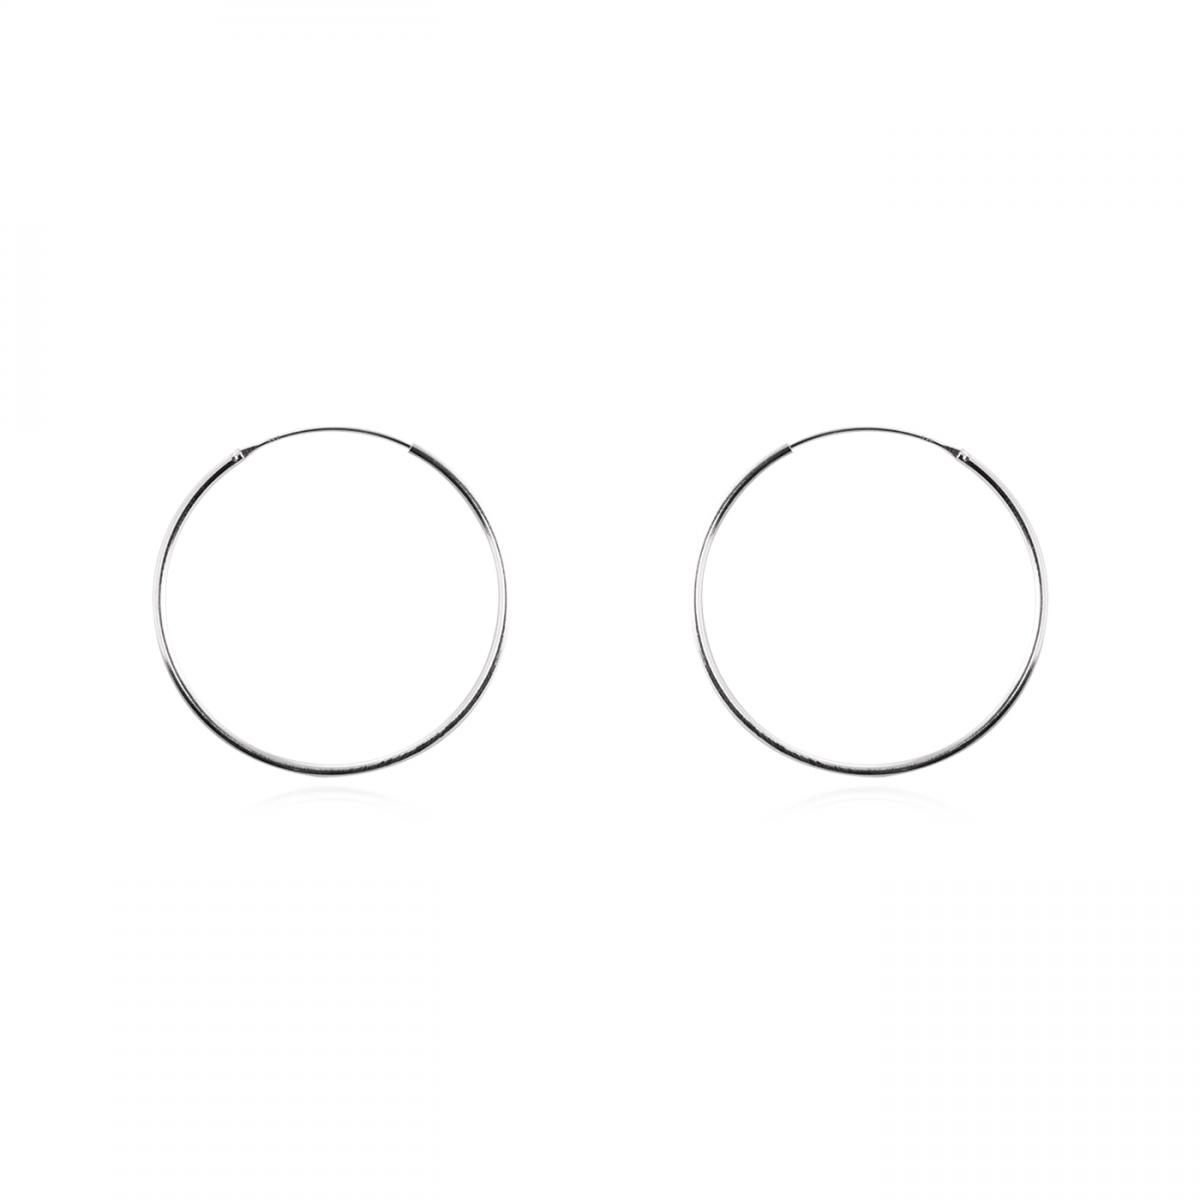 Brinco de Argola 3 cm - Prata Branca